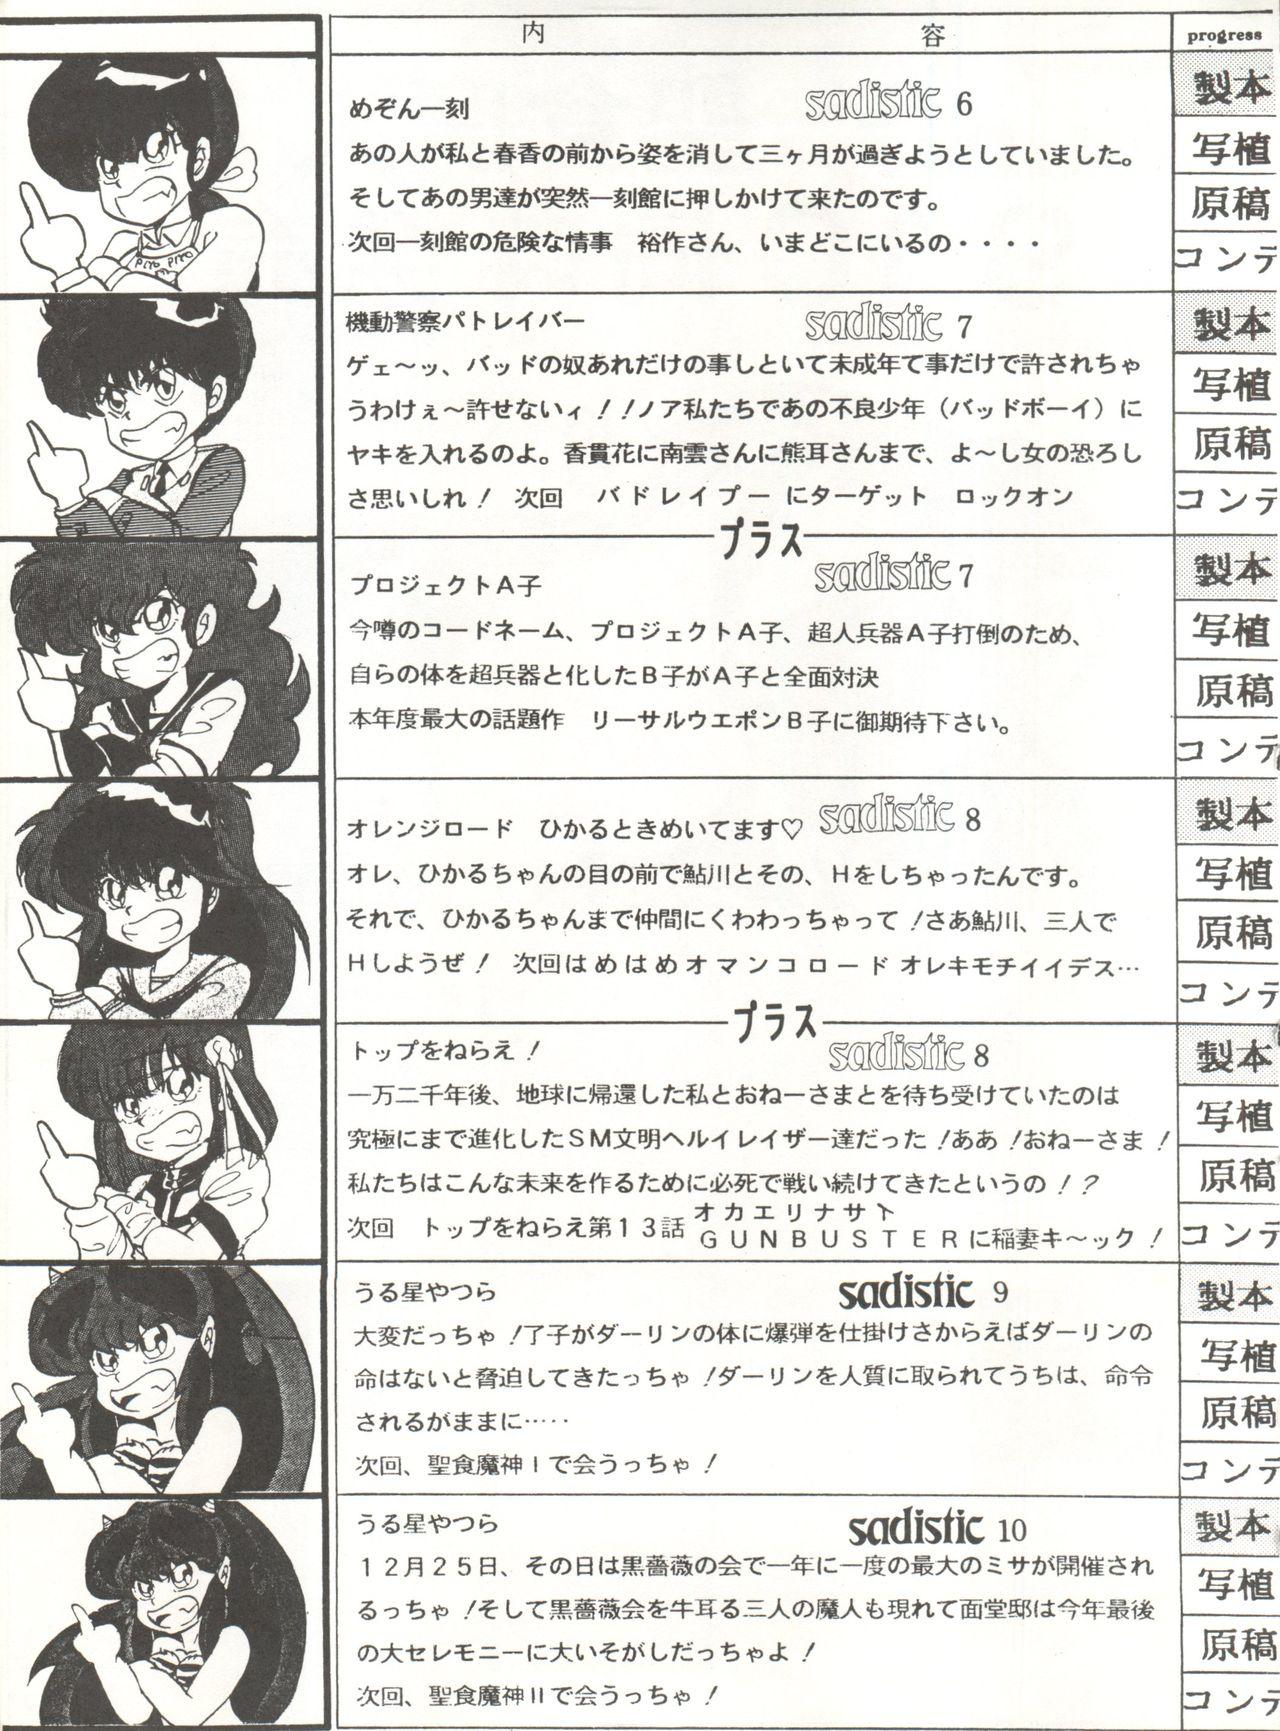 [Global One (MARO)] Sadistic 5 (Cutey Honey, Devilman, Sailor Moon), [Global One (MARO)] Sadistic (Dirty Pair, Fushigi no Umi no Nadia, Sailor Moon), [Studio Ikkatsumajin] .ribbon (Hime-chan's Ribbon) 122